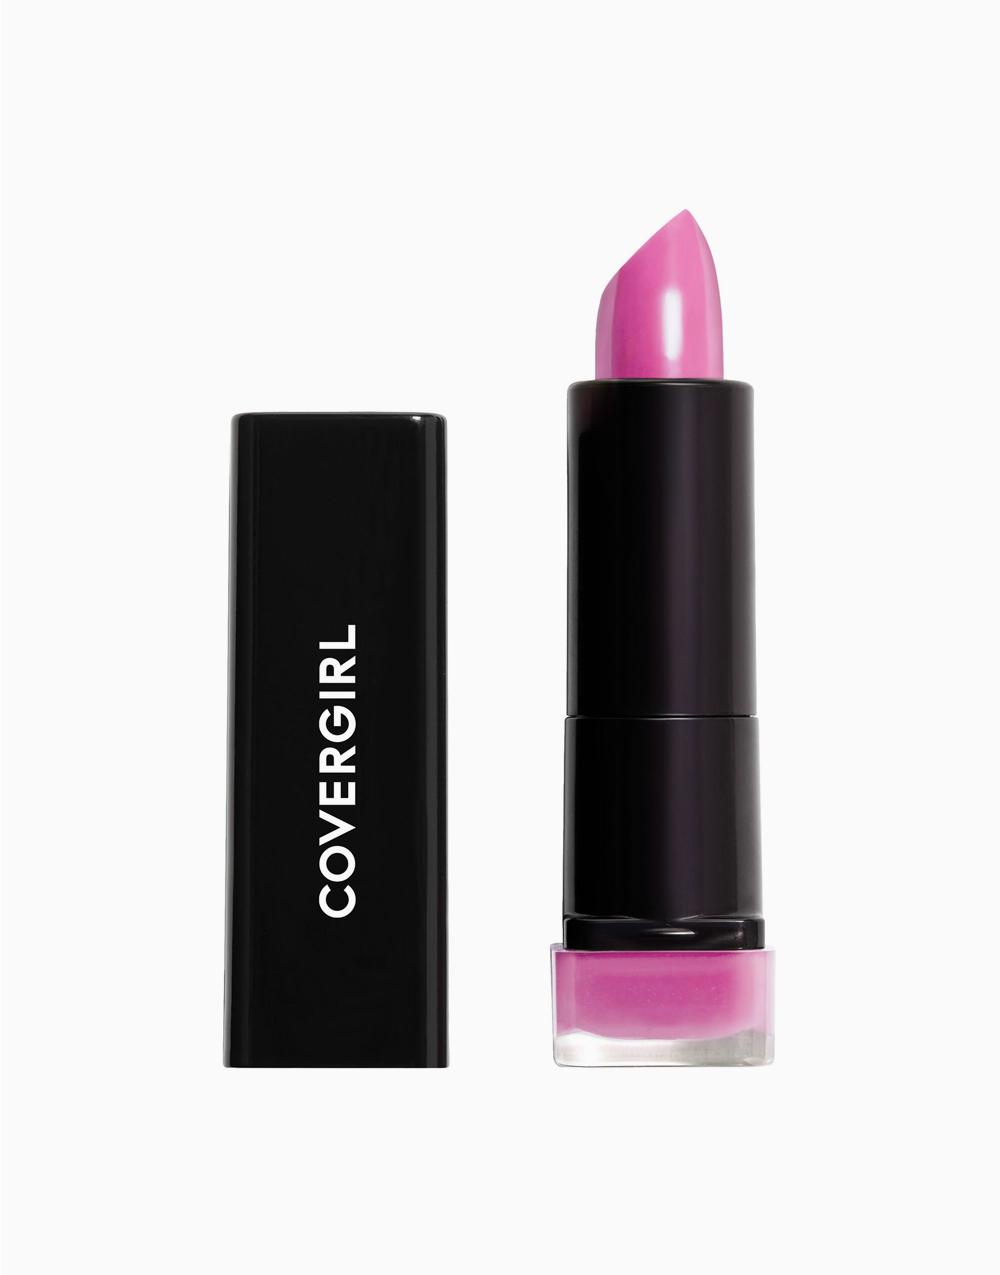 Exhibitionist Cream Lipstick by CoverGirl   Verve Violet